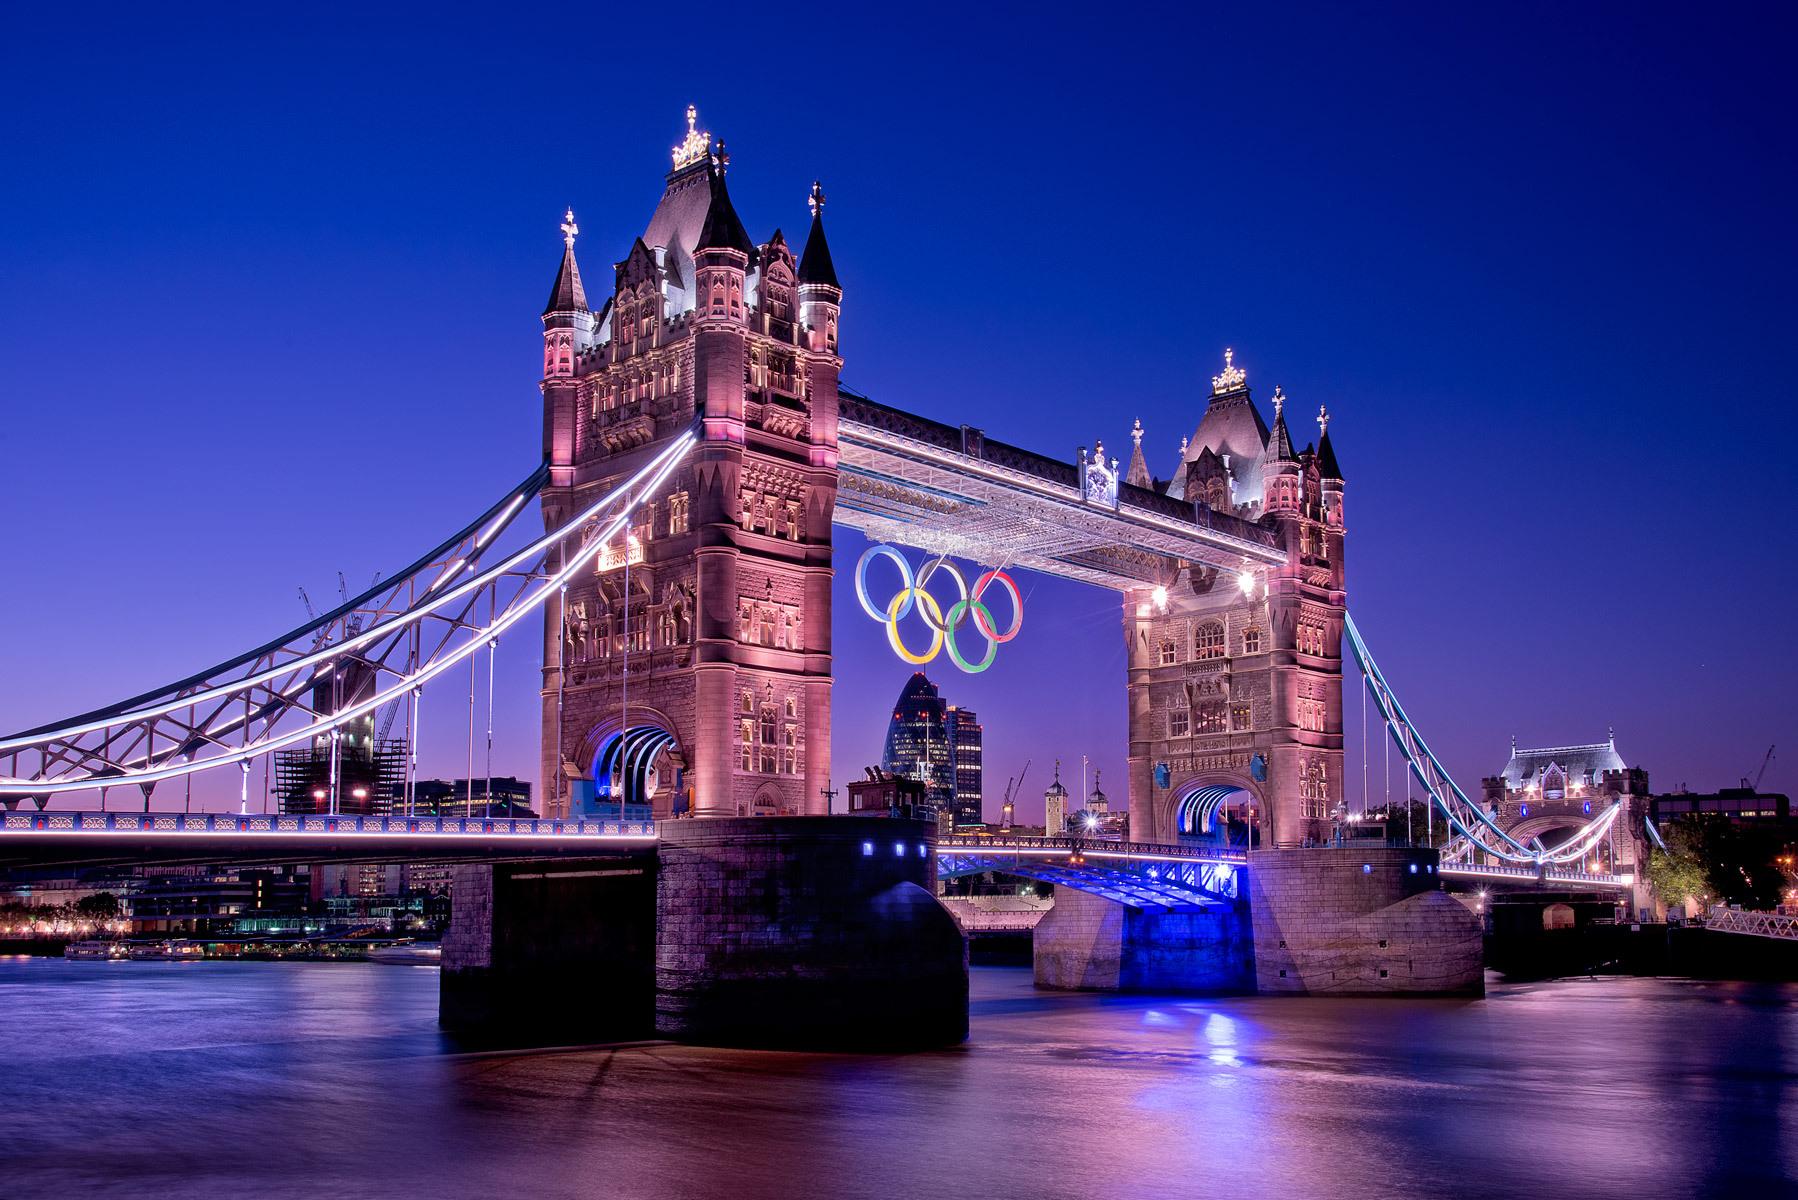 Tower Bridge, 2012 London Olympics